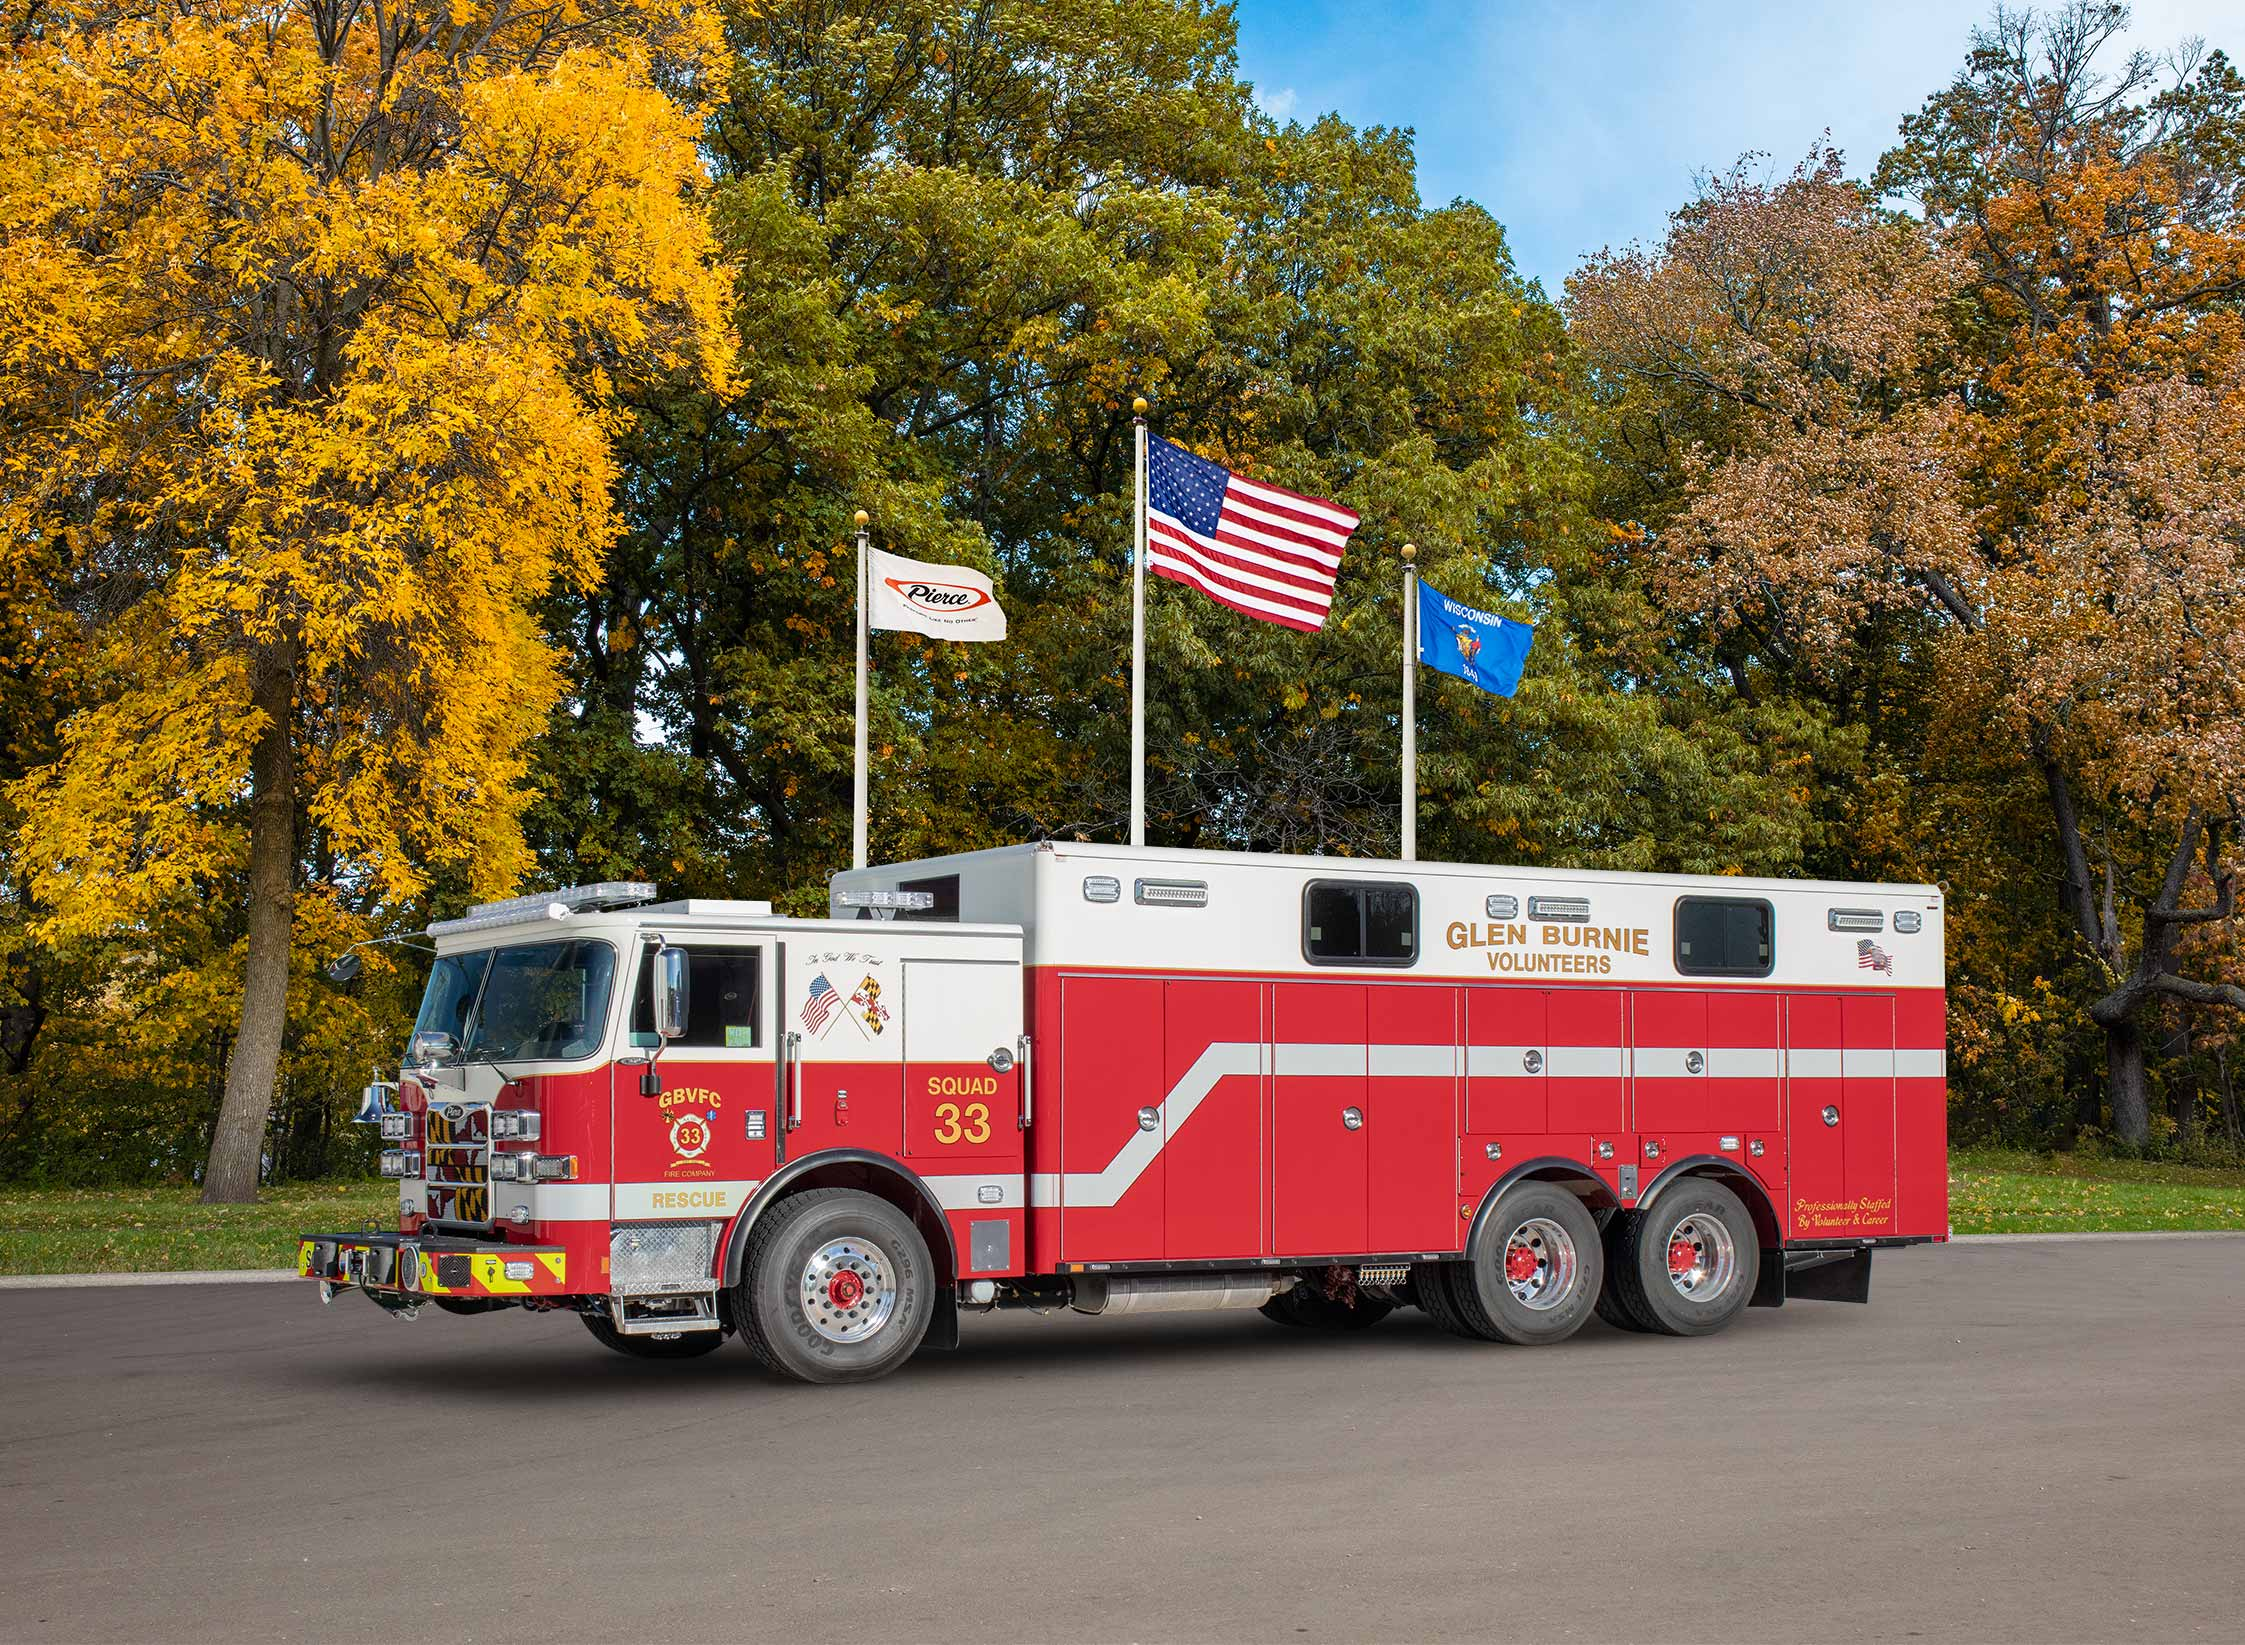 Glen Burnie Volunteer Fire Company - Rescue